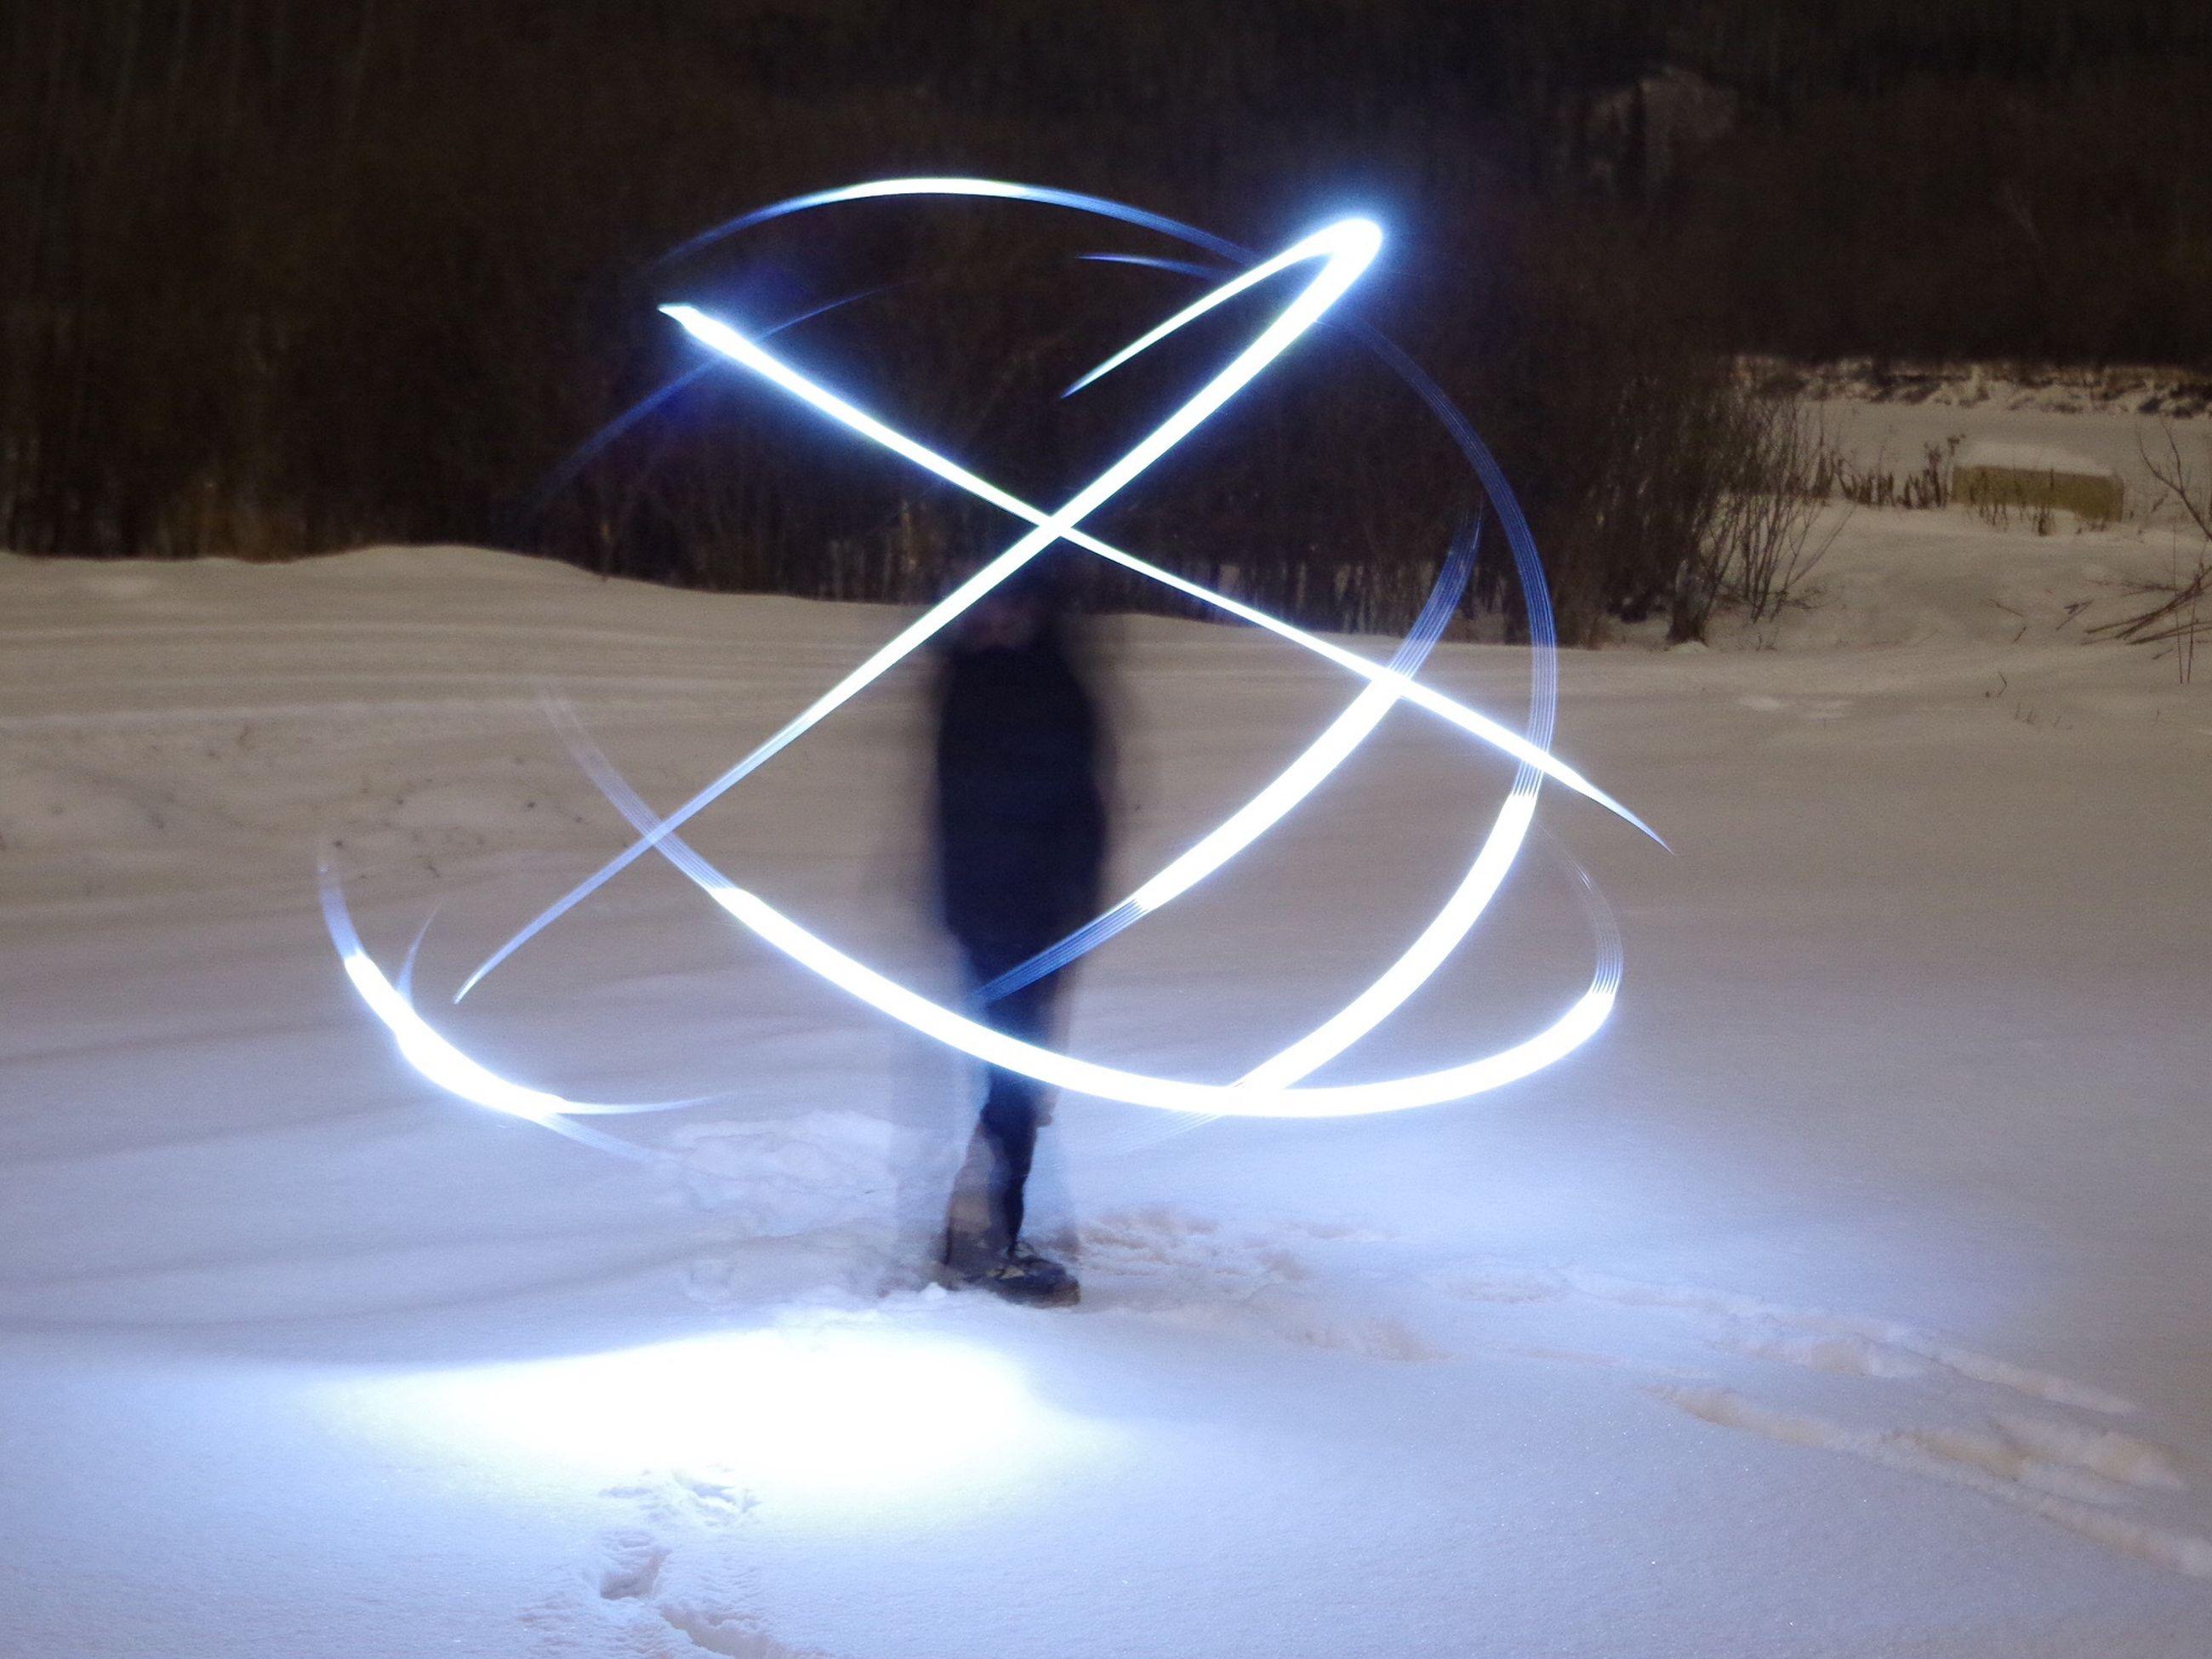 night, illuminated, glowing, lighting equipment, snow, winter, no people, cold temperature, shadow, white color, art and craft, creativity, art, sunlight, light - natural phenomenon, outdoors, street light, ideas, close-up, still life